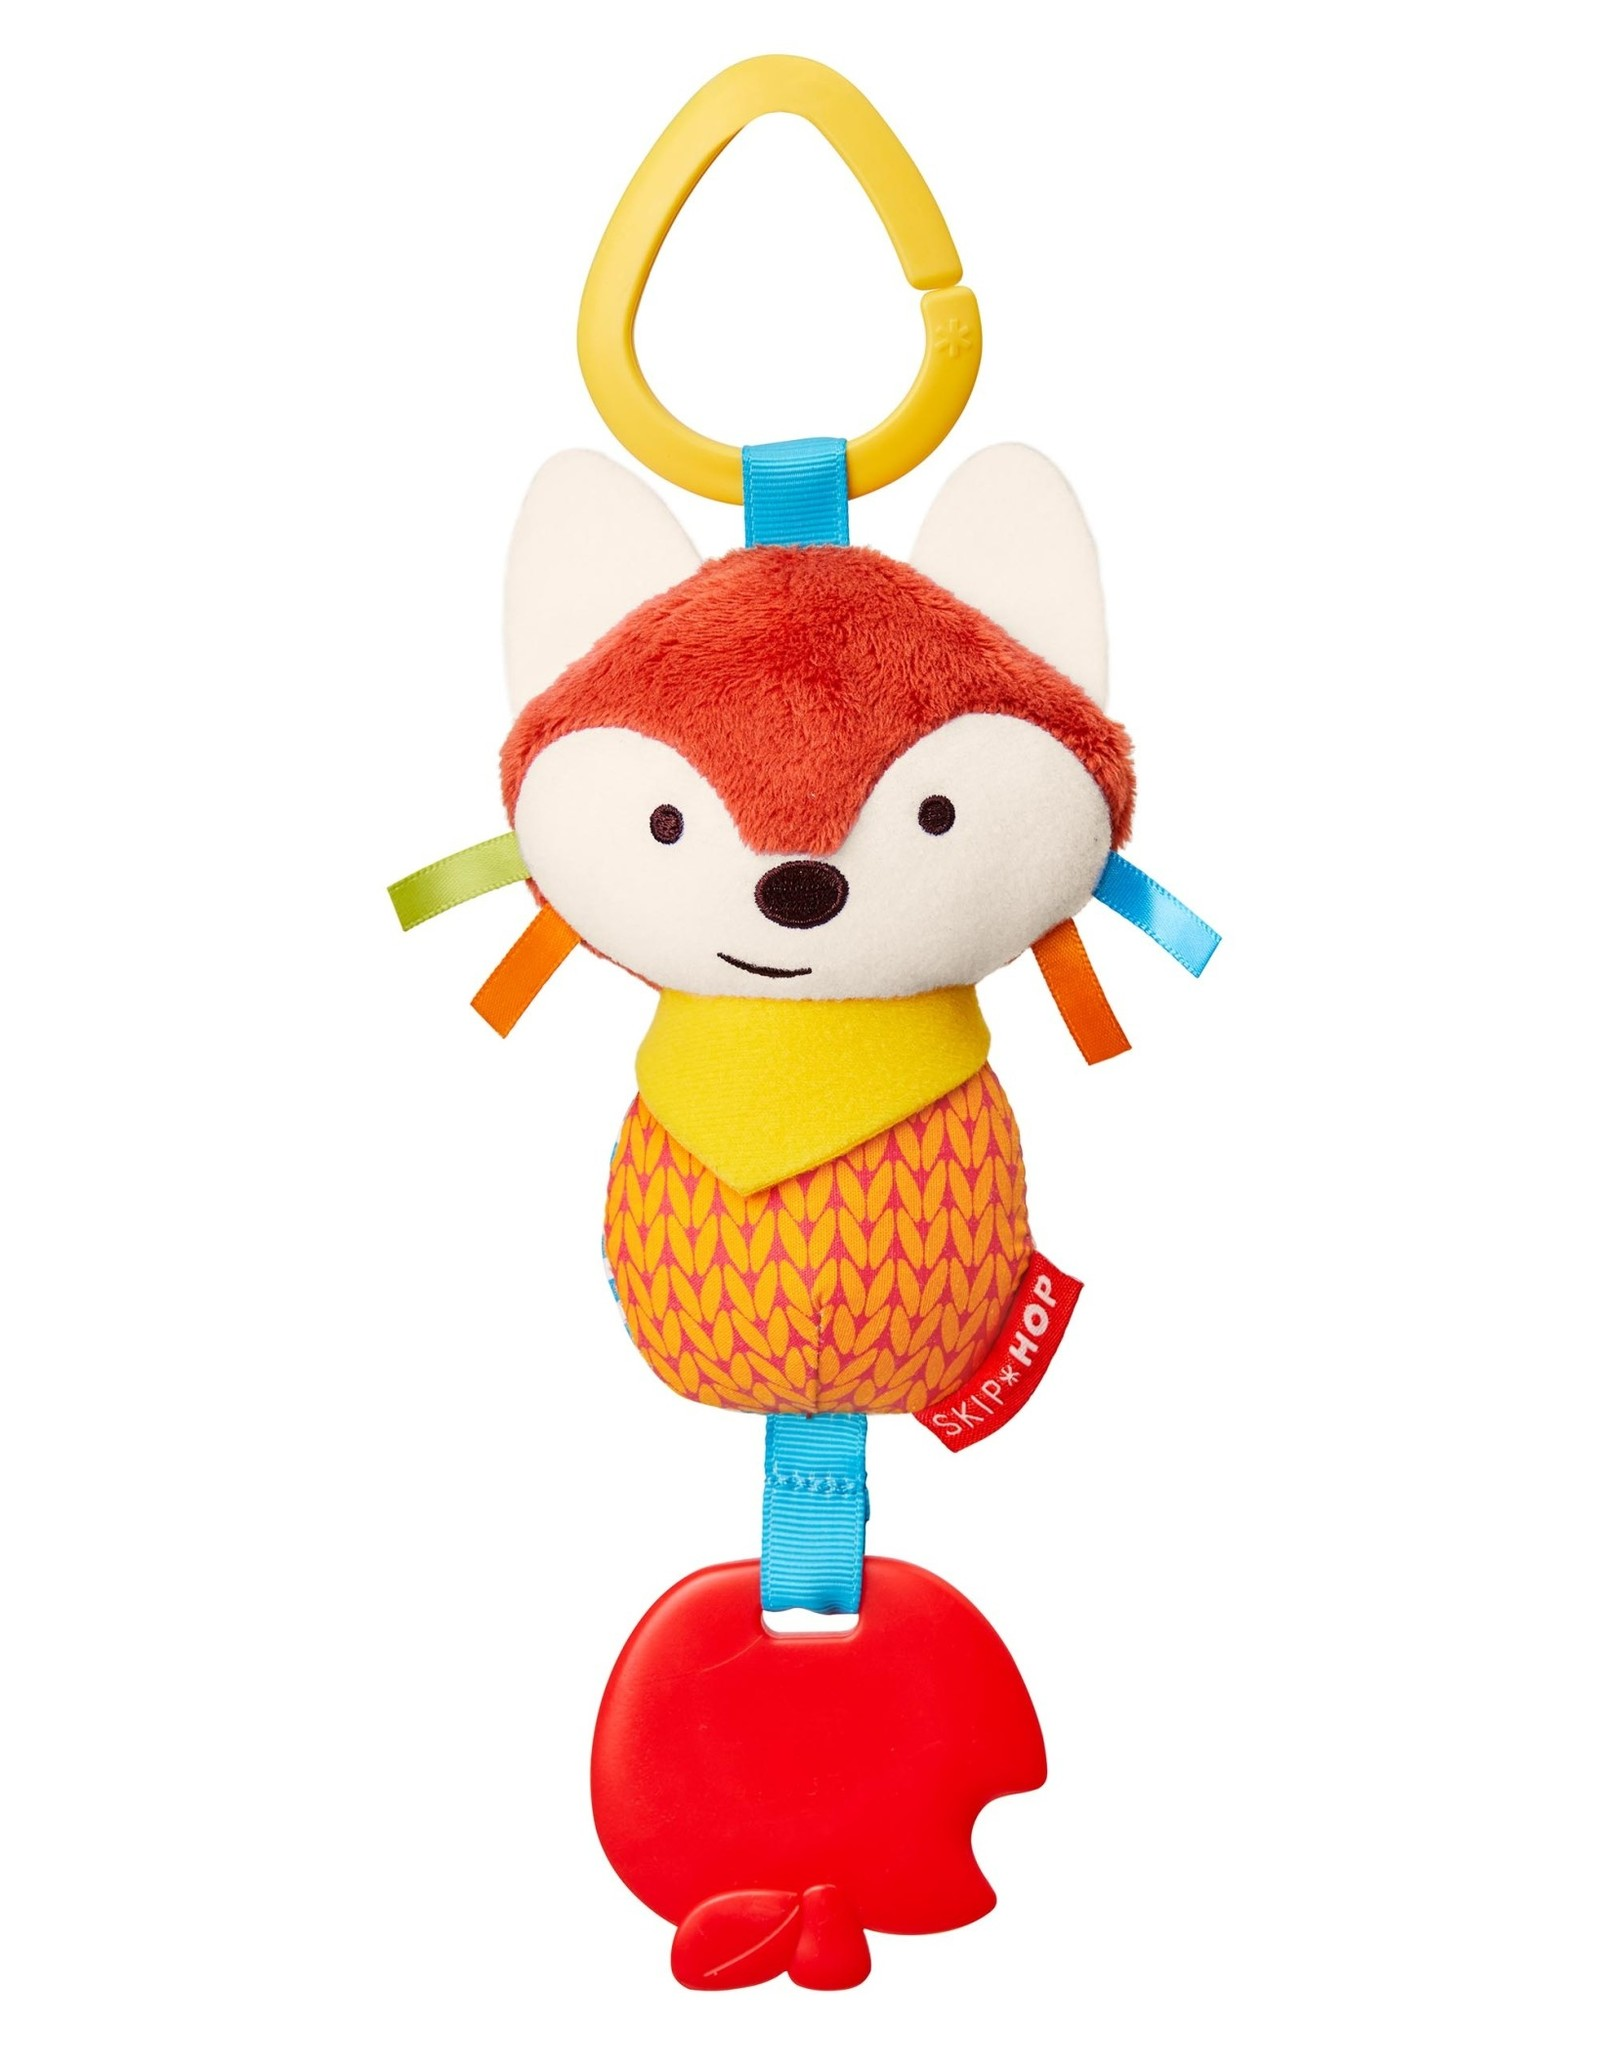 Skip Hop Bandana Buddies Teether Toy, Fox